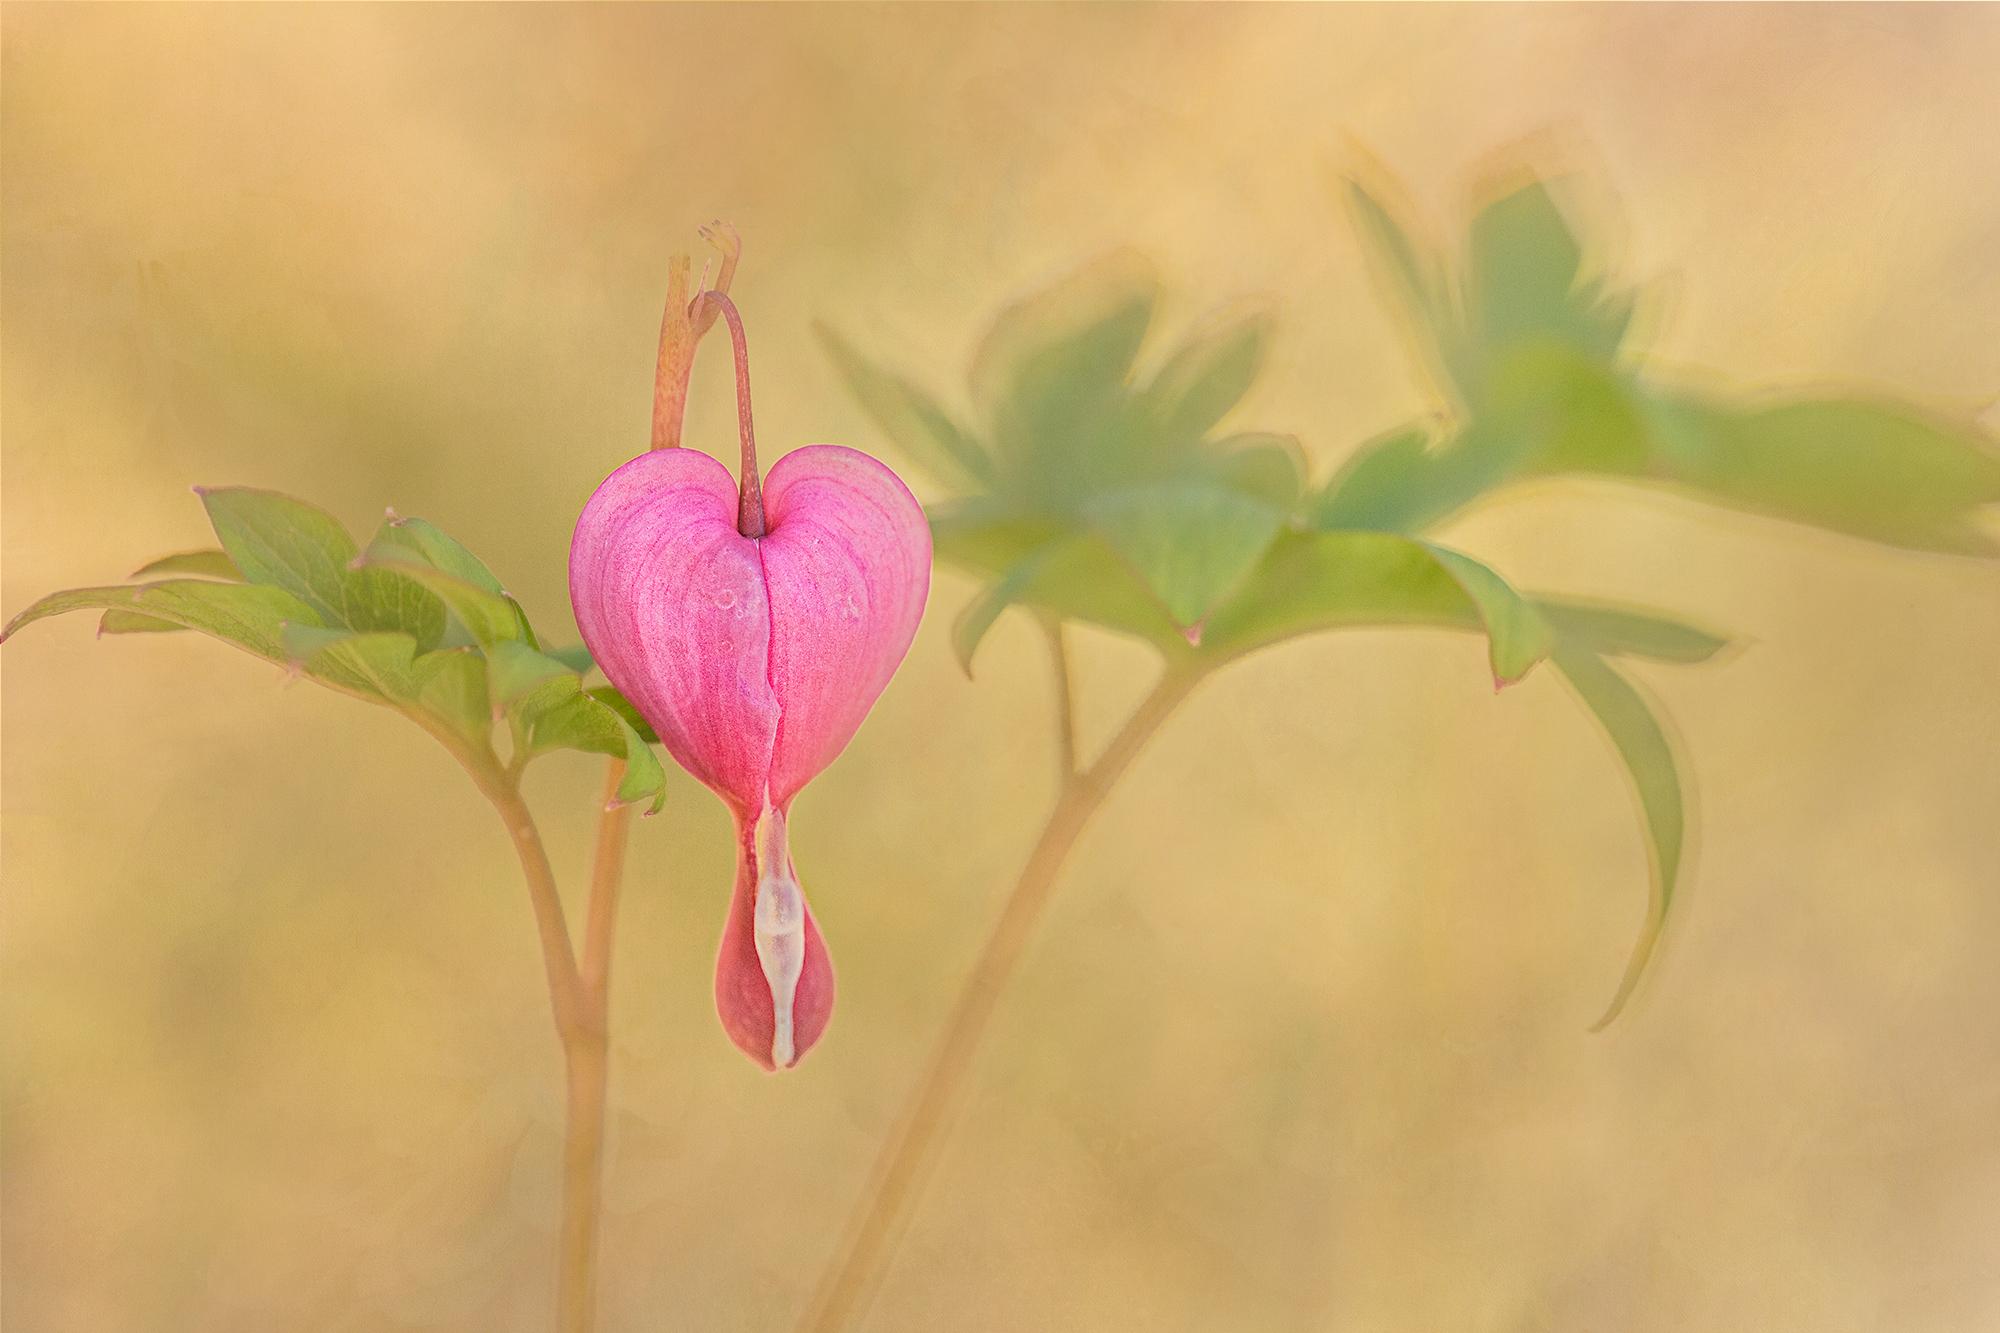 bleeding heart blosson.jpg